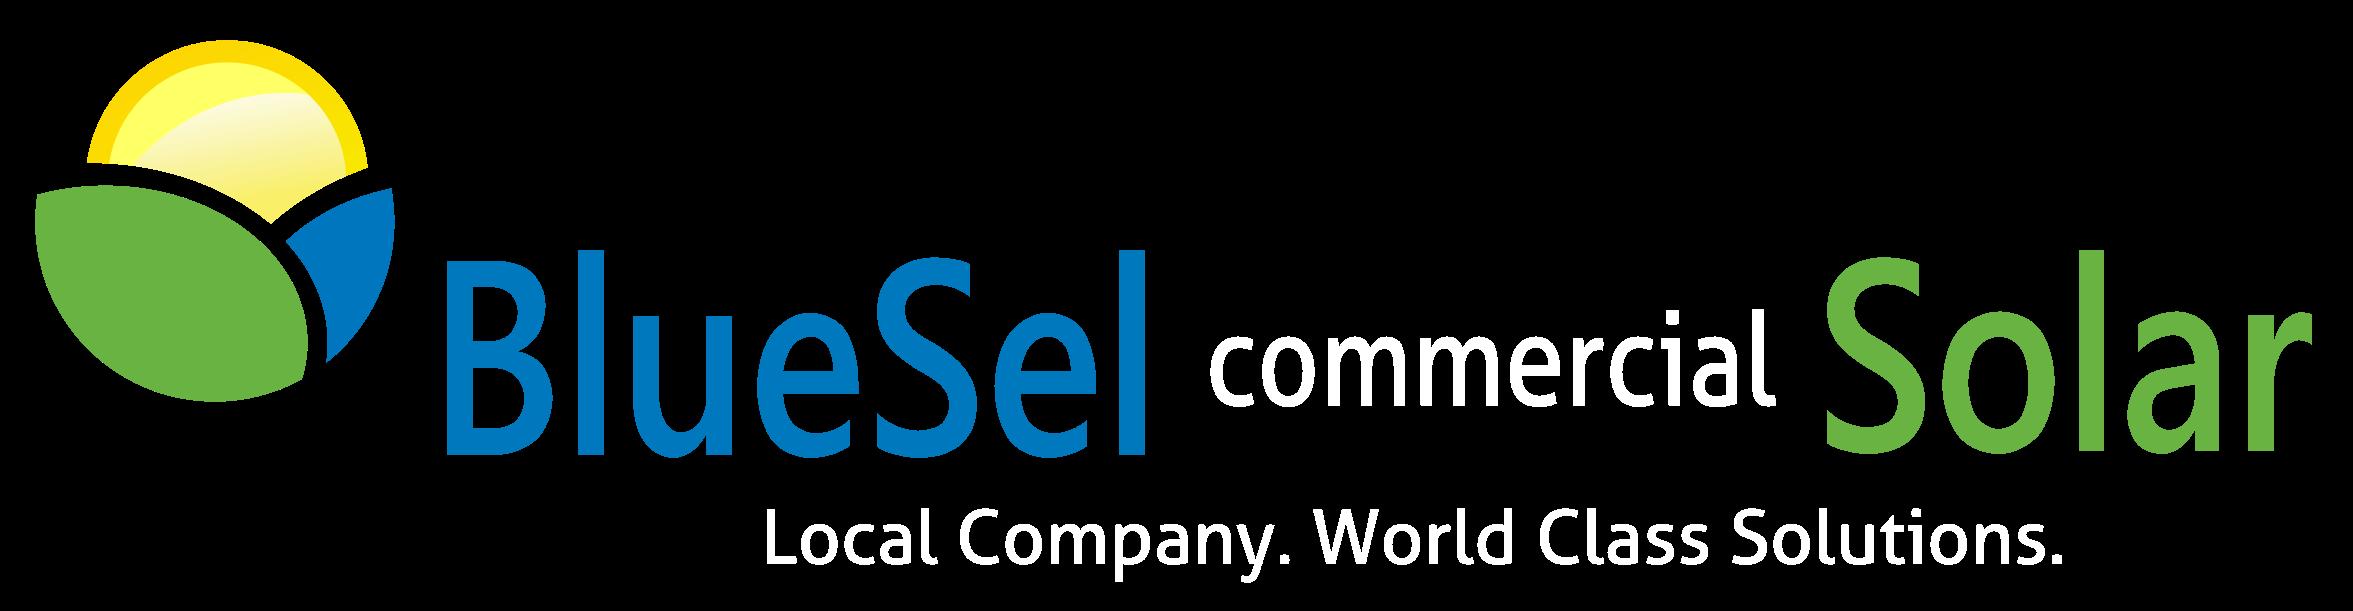 BlueSel Commercial Solar